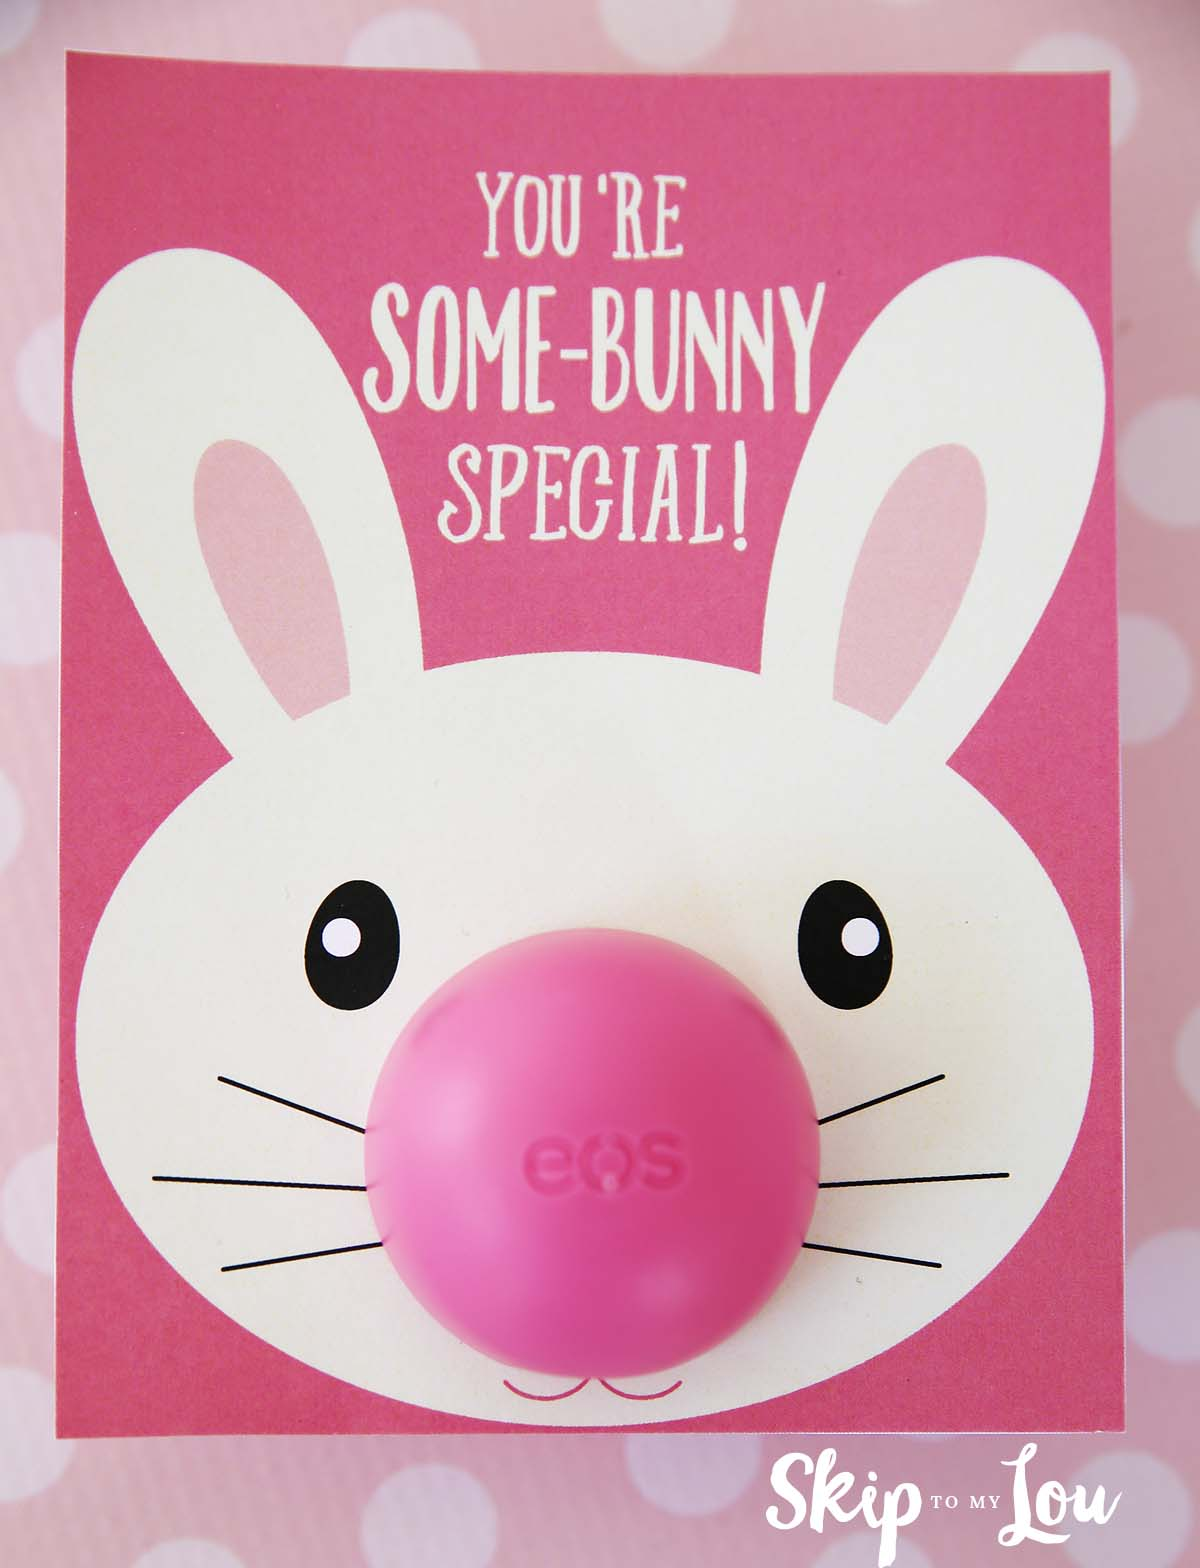 Bunny eos lip balm gift skip to my lou bunny eos lip balm gift negle Gallery